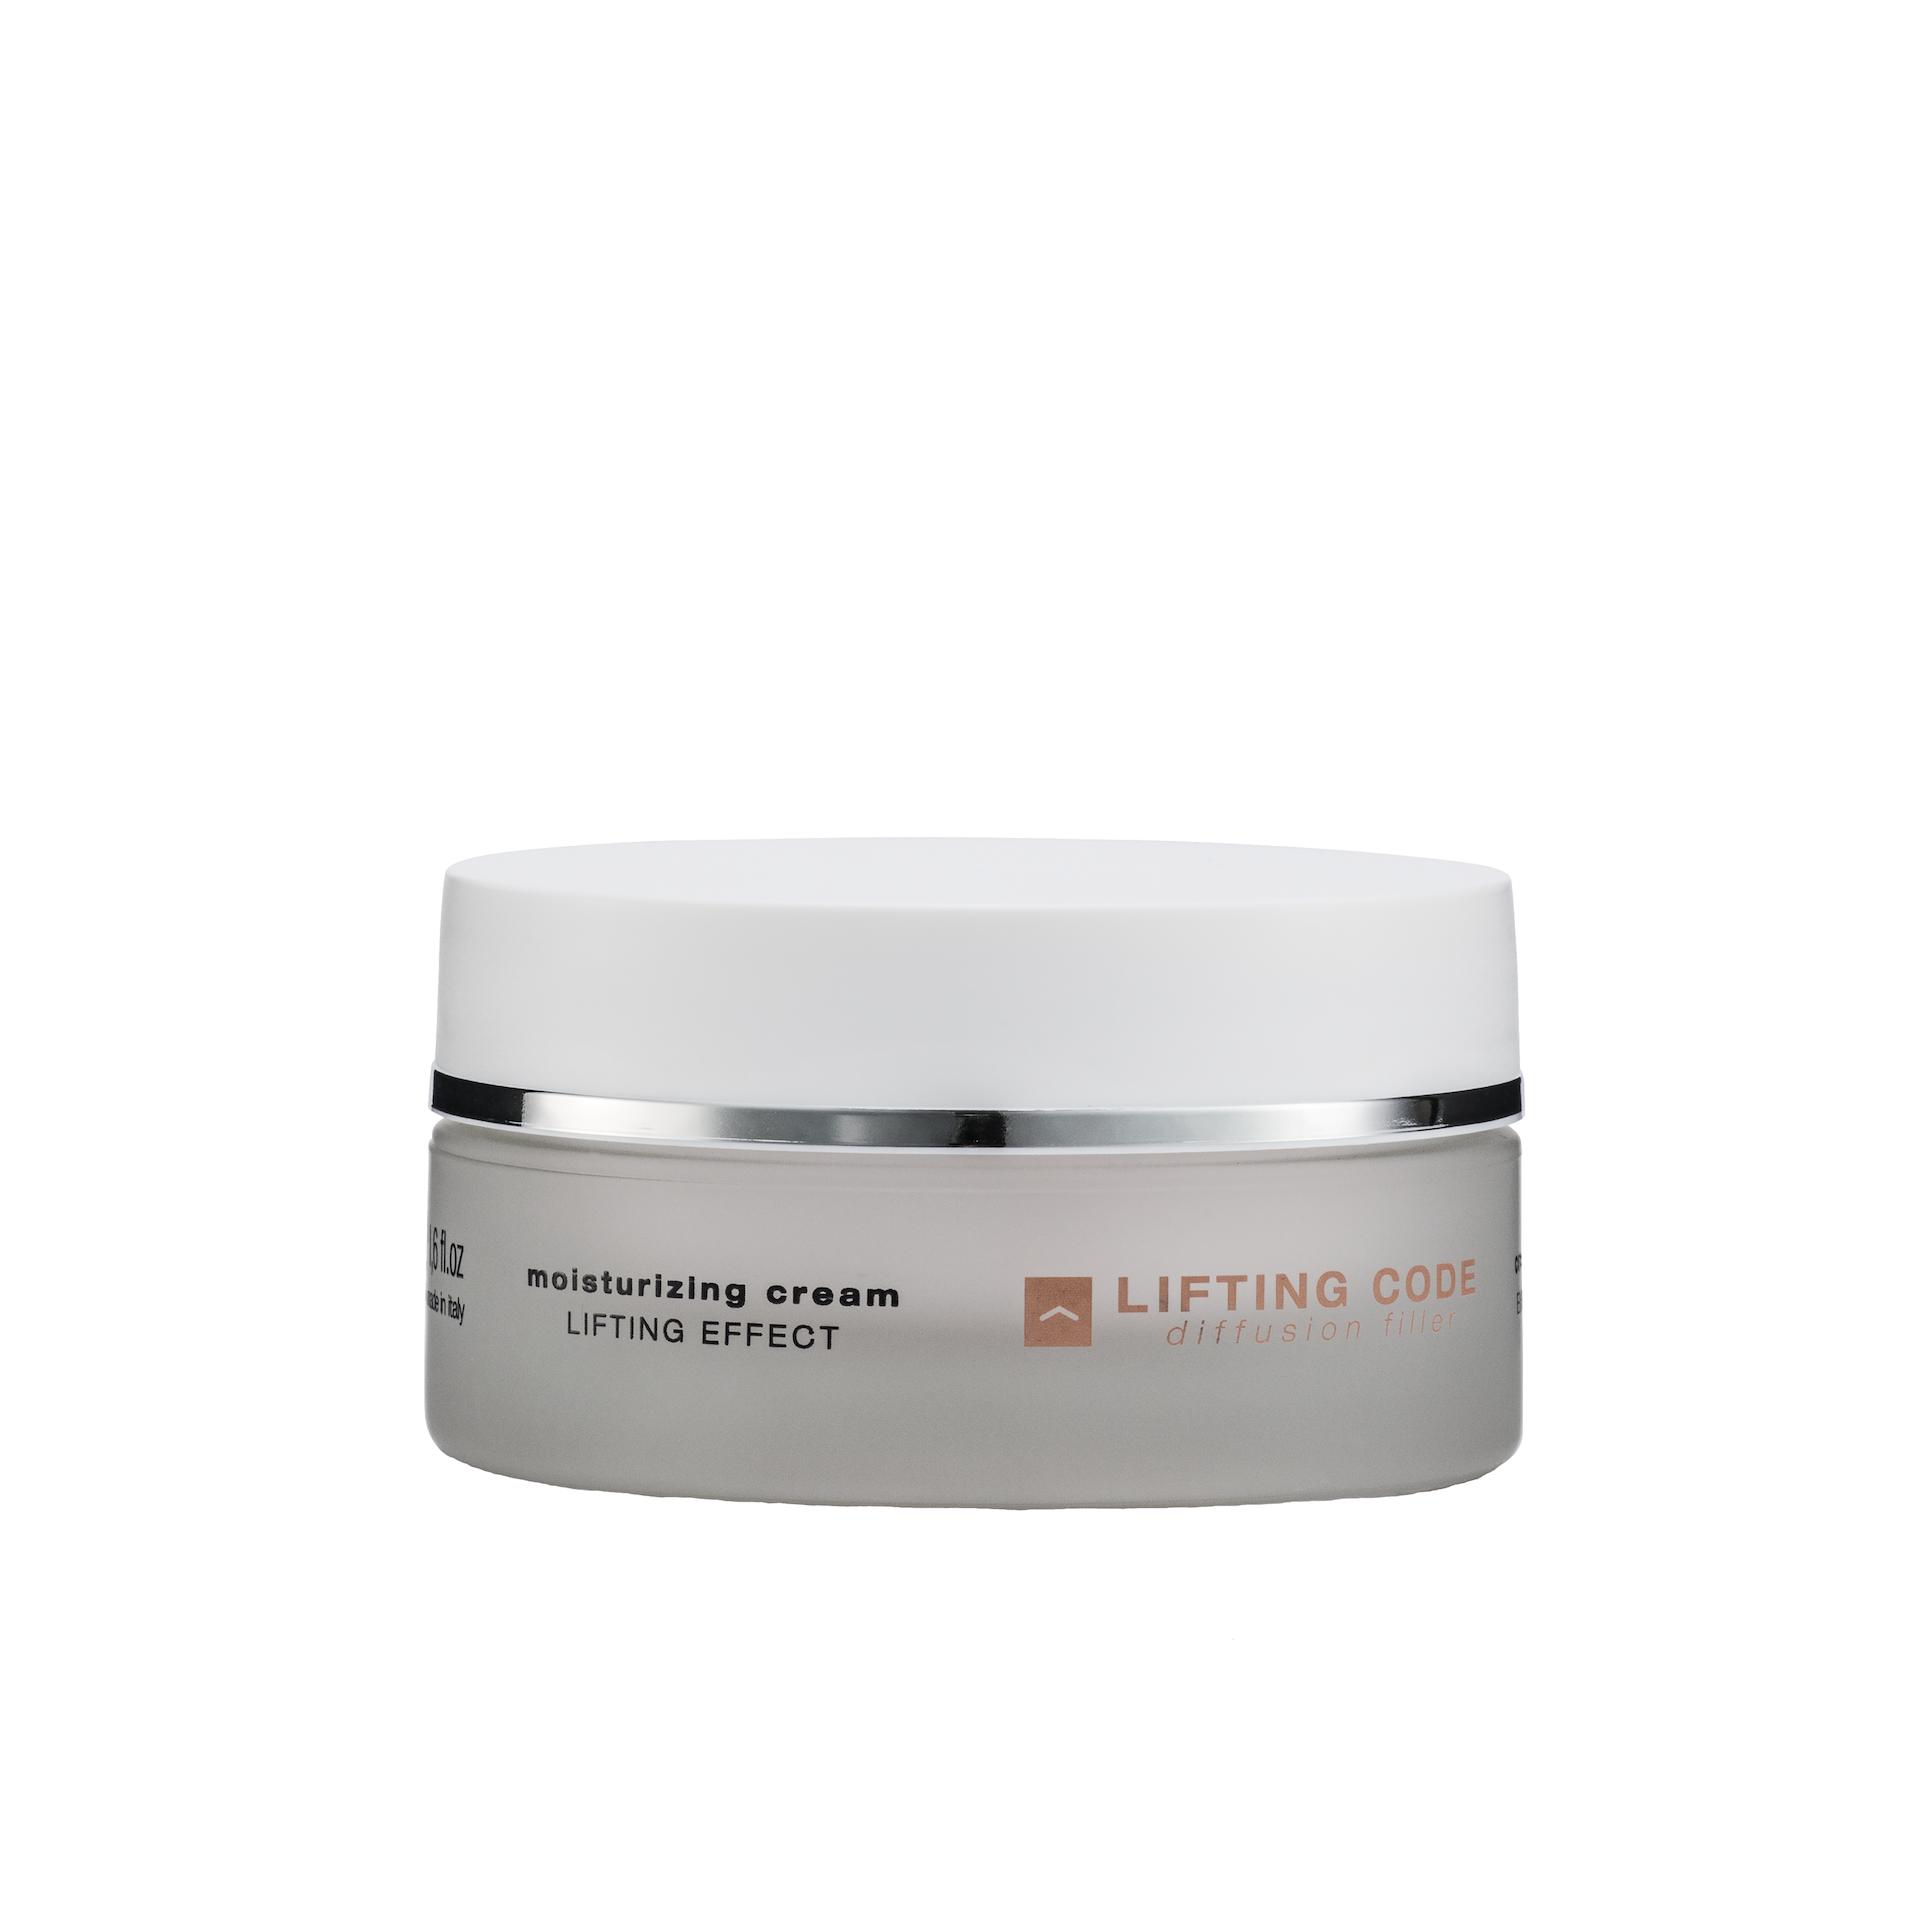 Bioline Lifting Code Moisturiz Bioline Lifting Code Moisturizing Day Cream 50ml